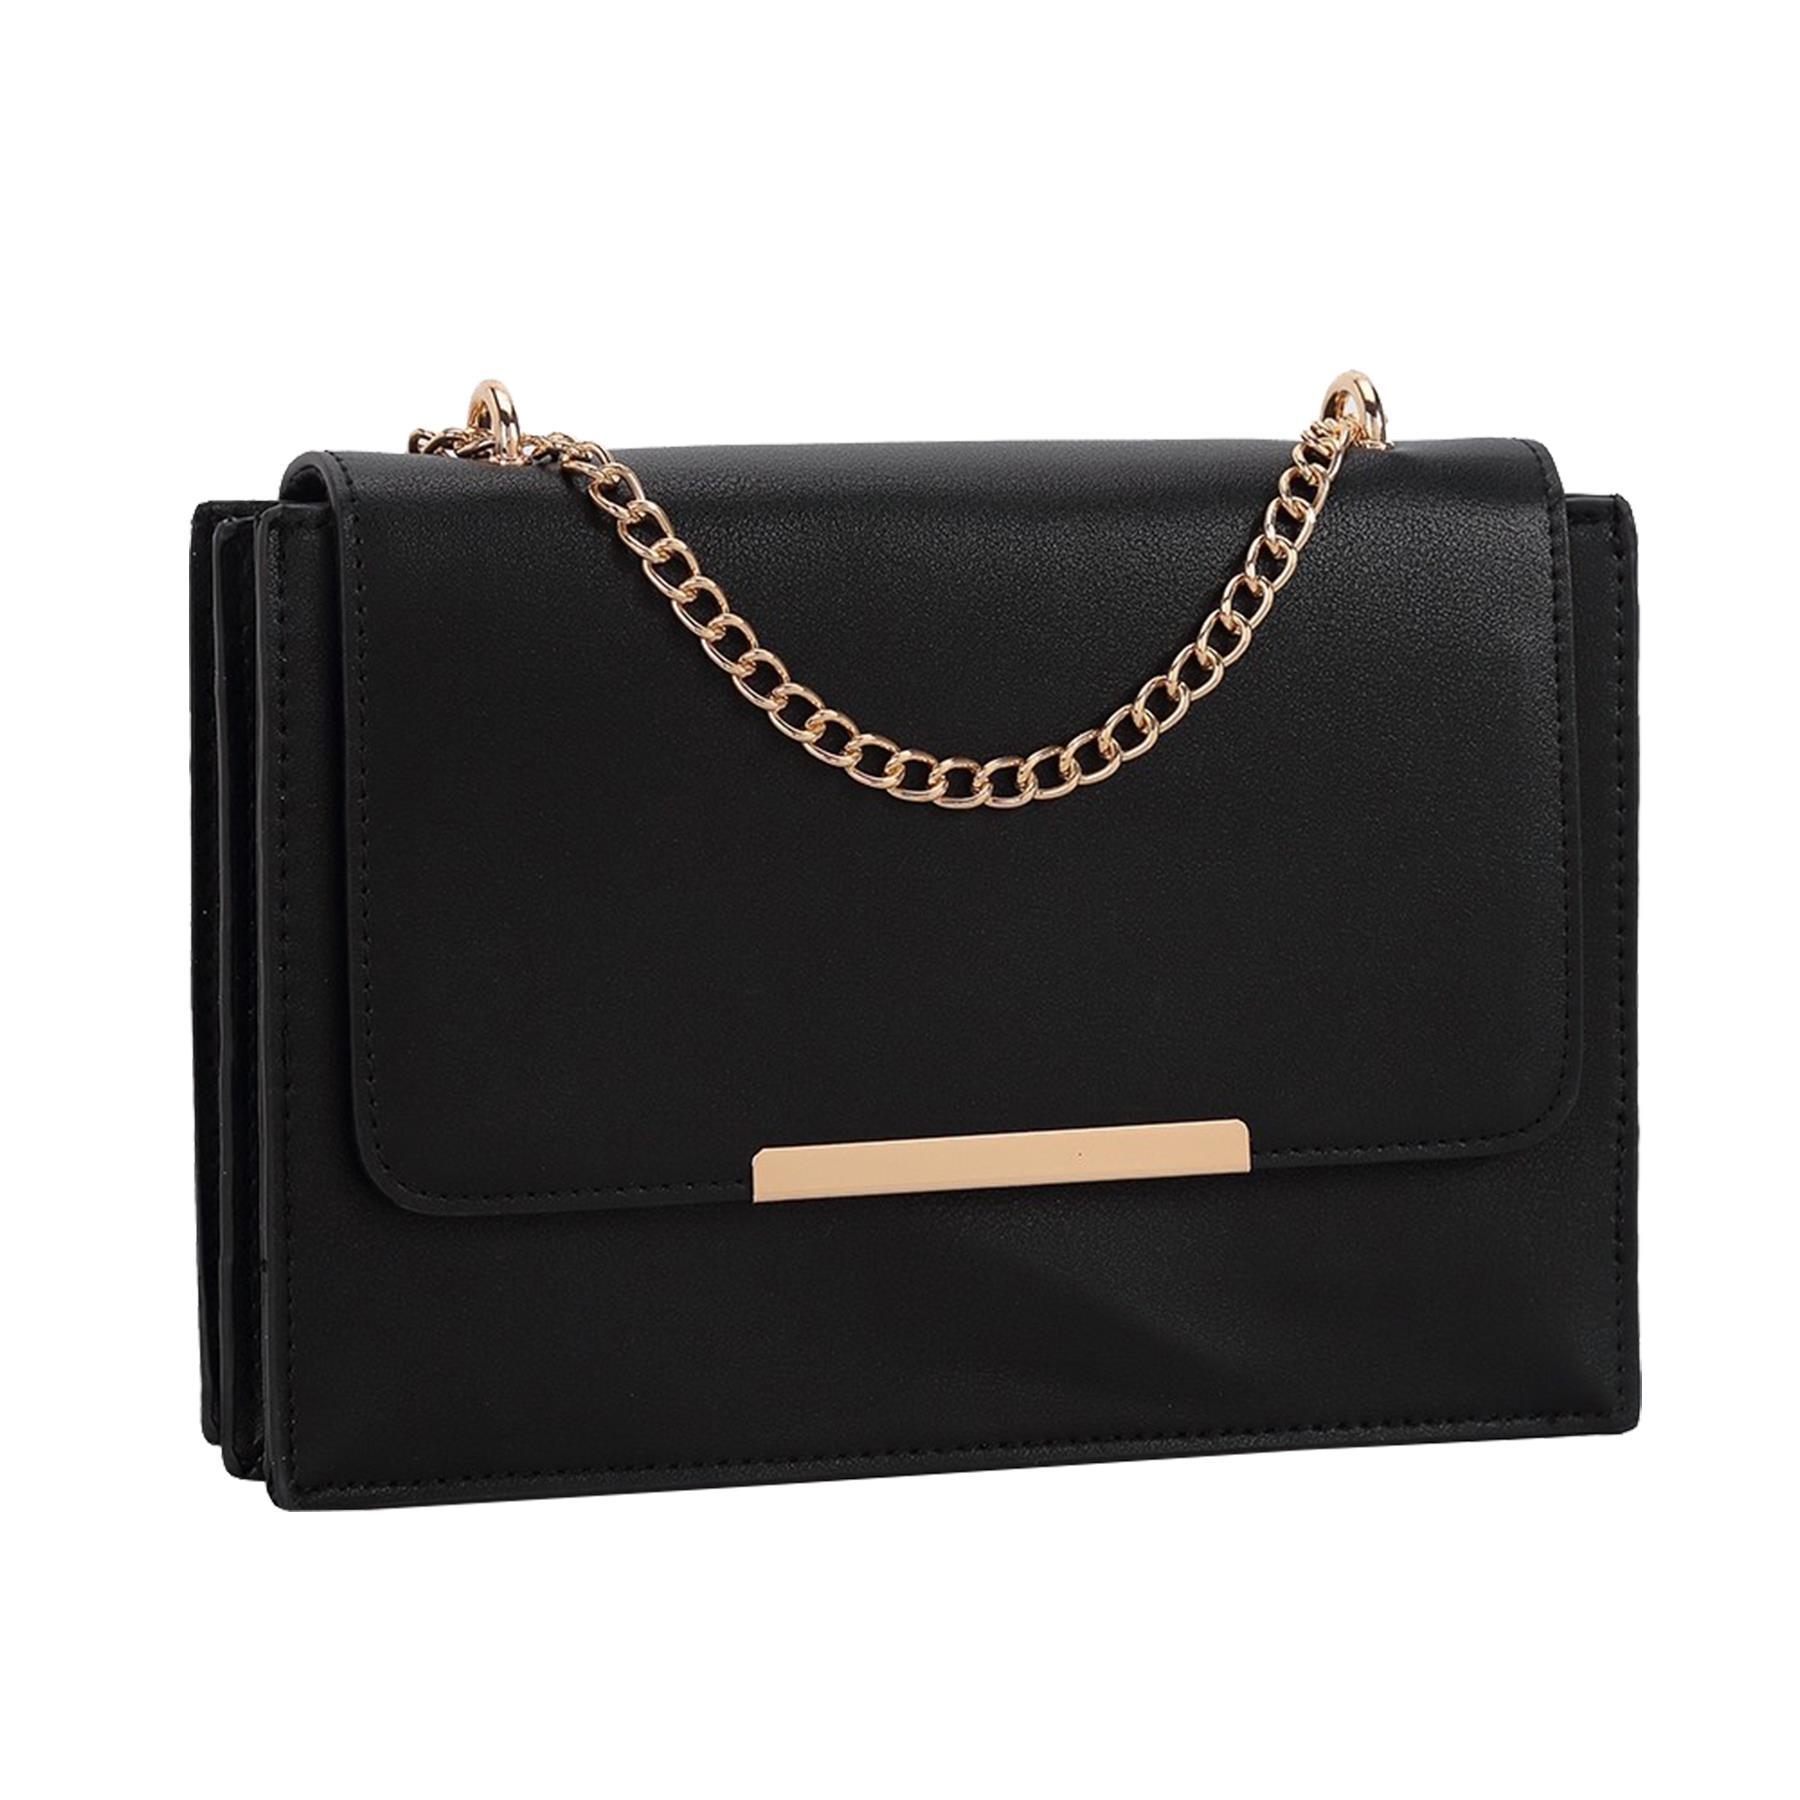 New-Women-s-Faux-Leather-Elegant-Stylish-Fashion-Shoulder-Clutch-Bag thumbnail 3